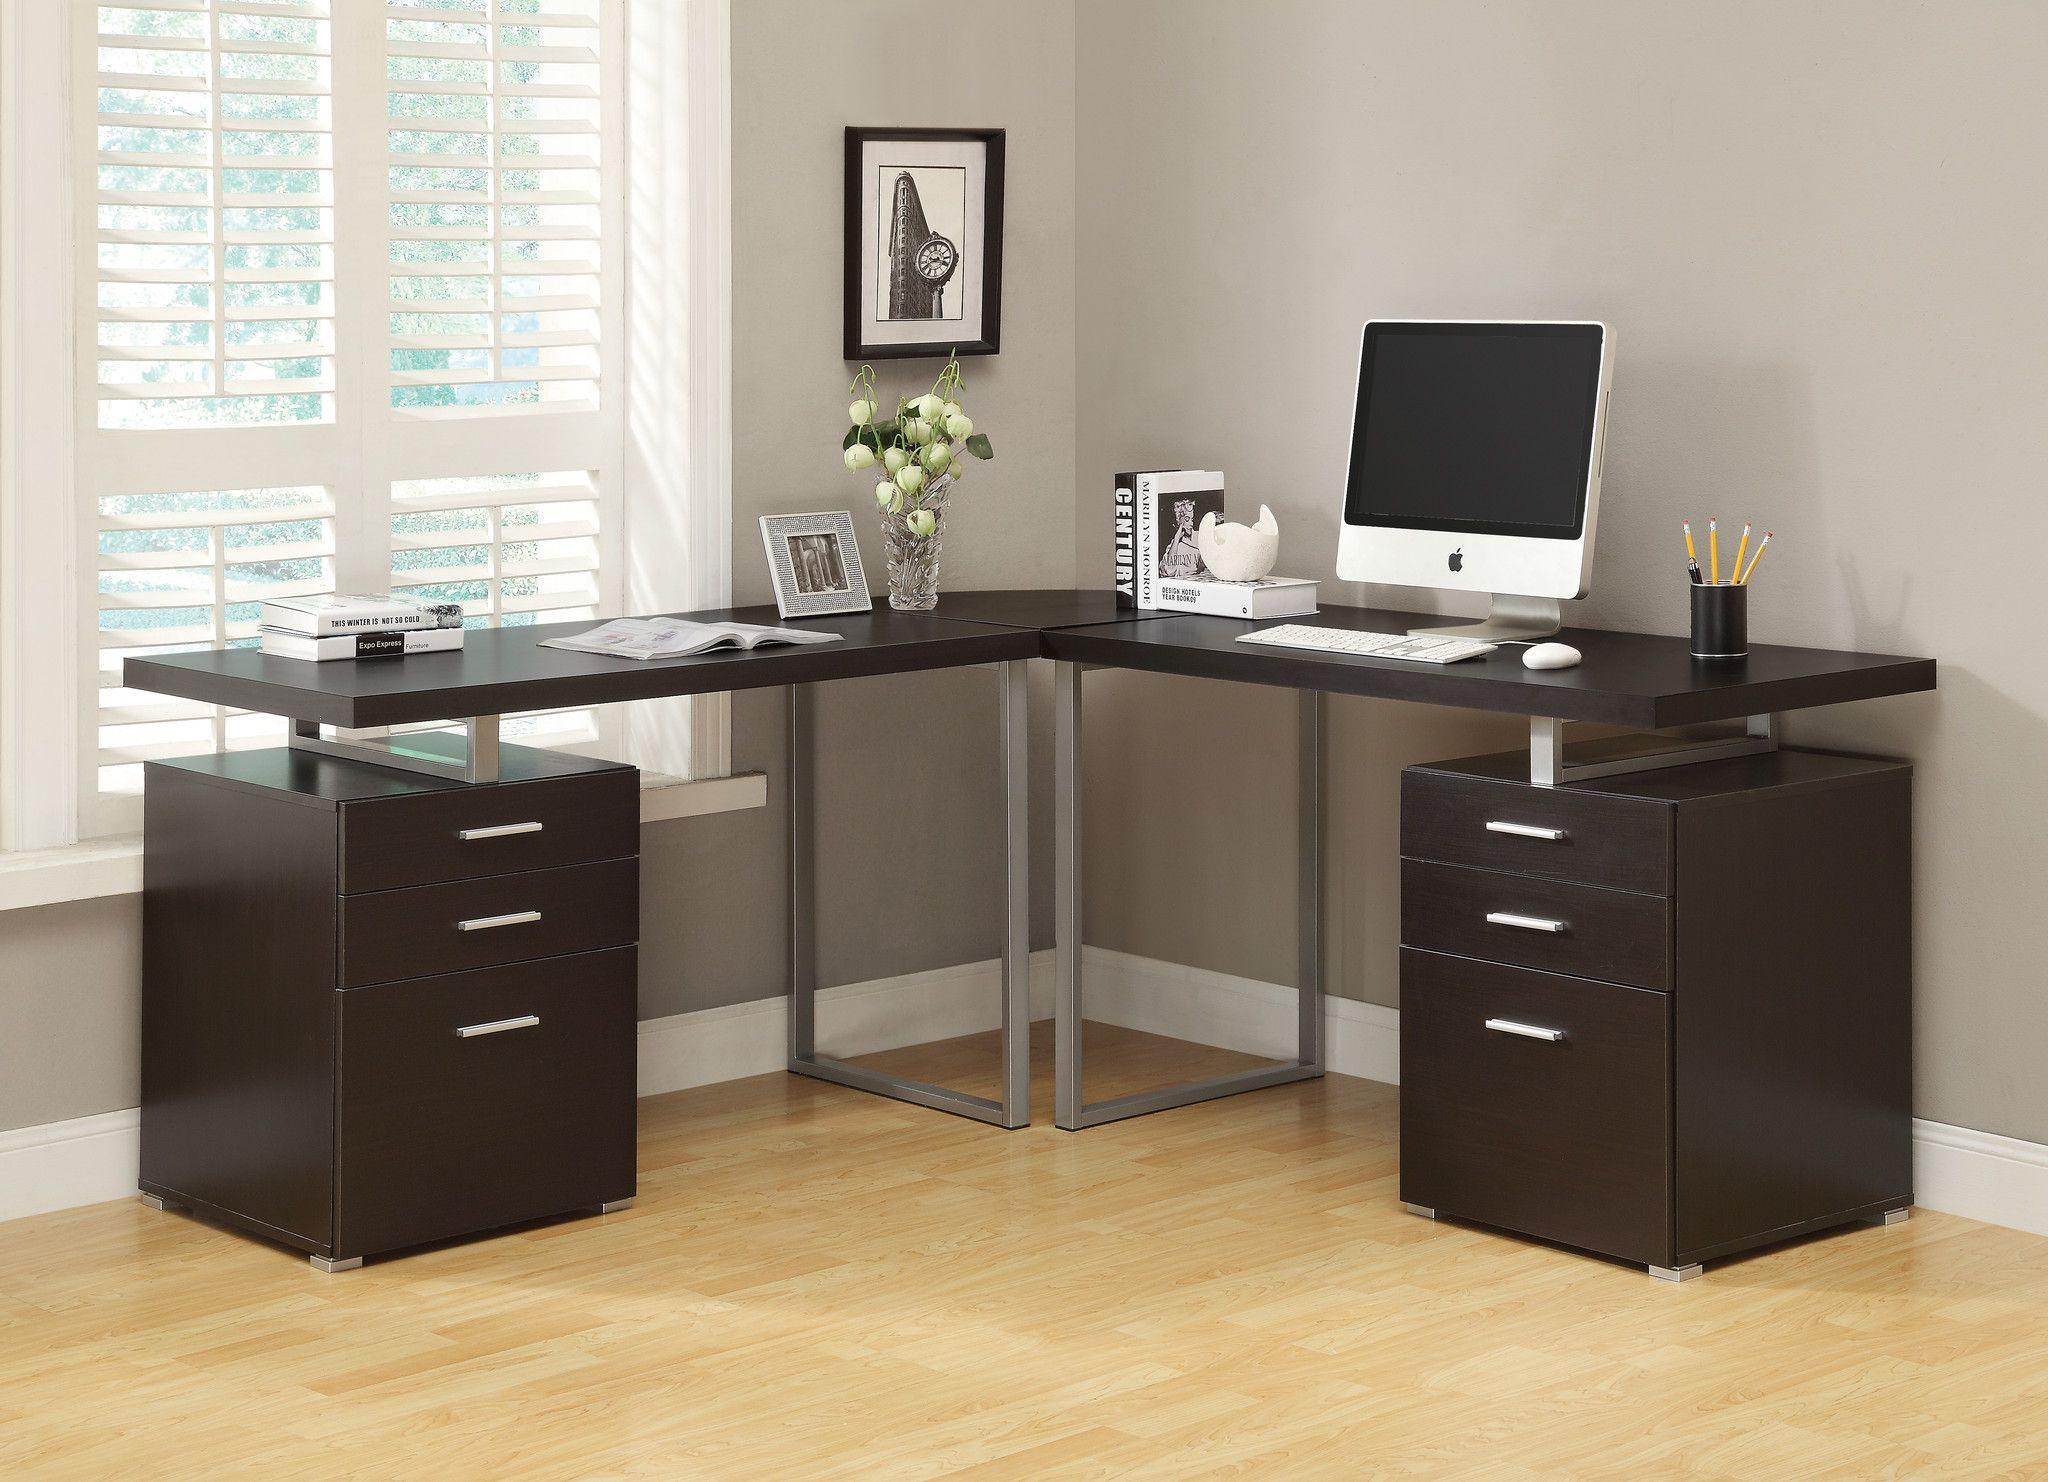 cabinet l shaped with large filing home ideas furniture thedigitalhandshake desk stunning image of